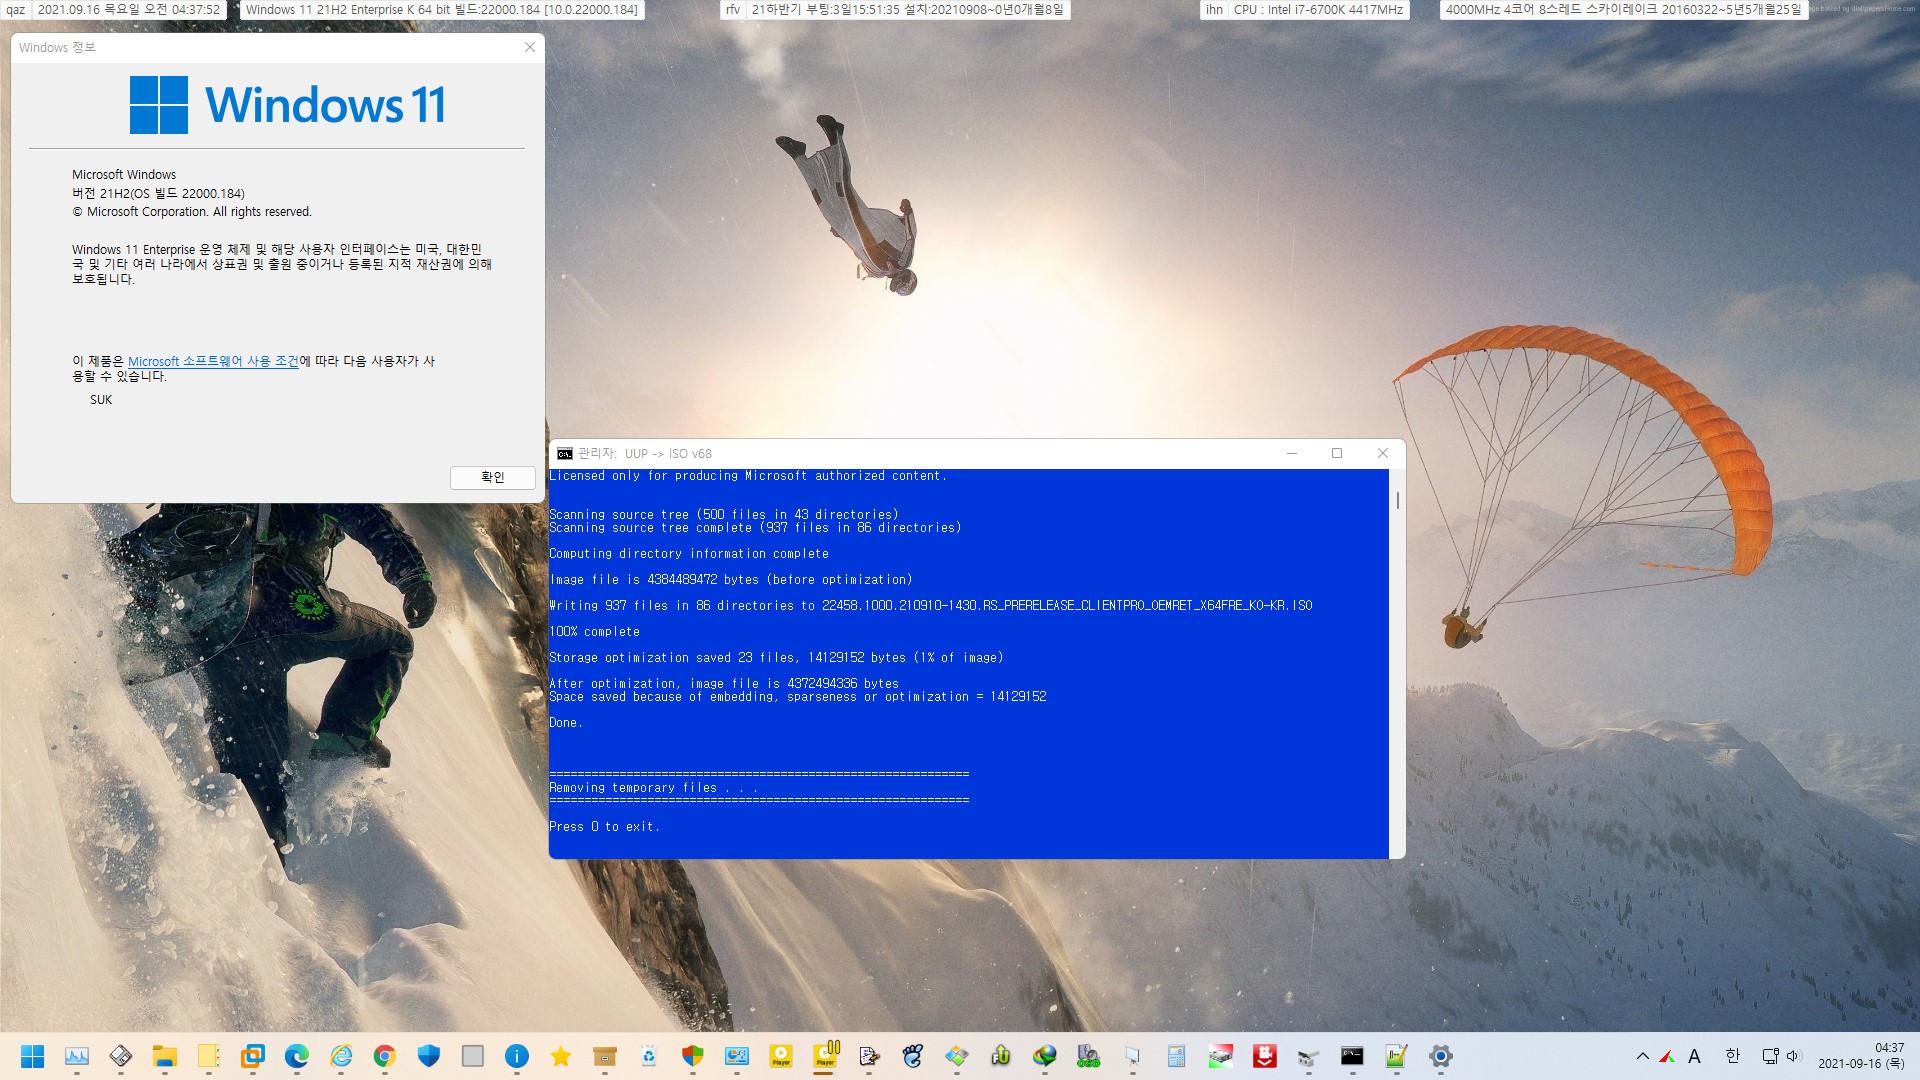 Windows 11 인사이더 프리뷰 - 버전 Dev (OS 빌드 22458.1000) 나왔네요 - 개발자 채널 - uup 사이트 2군데 전부 한국어 iso가 install.wim 단계에서 오류가 생겨서 윈도우 업데이트에서 uup 파일들 다운로드하여 iso 만드는데 성공했습니다 2021-09-16_043753.jpg